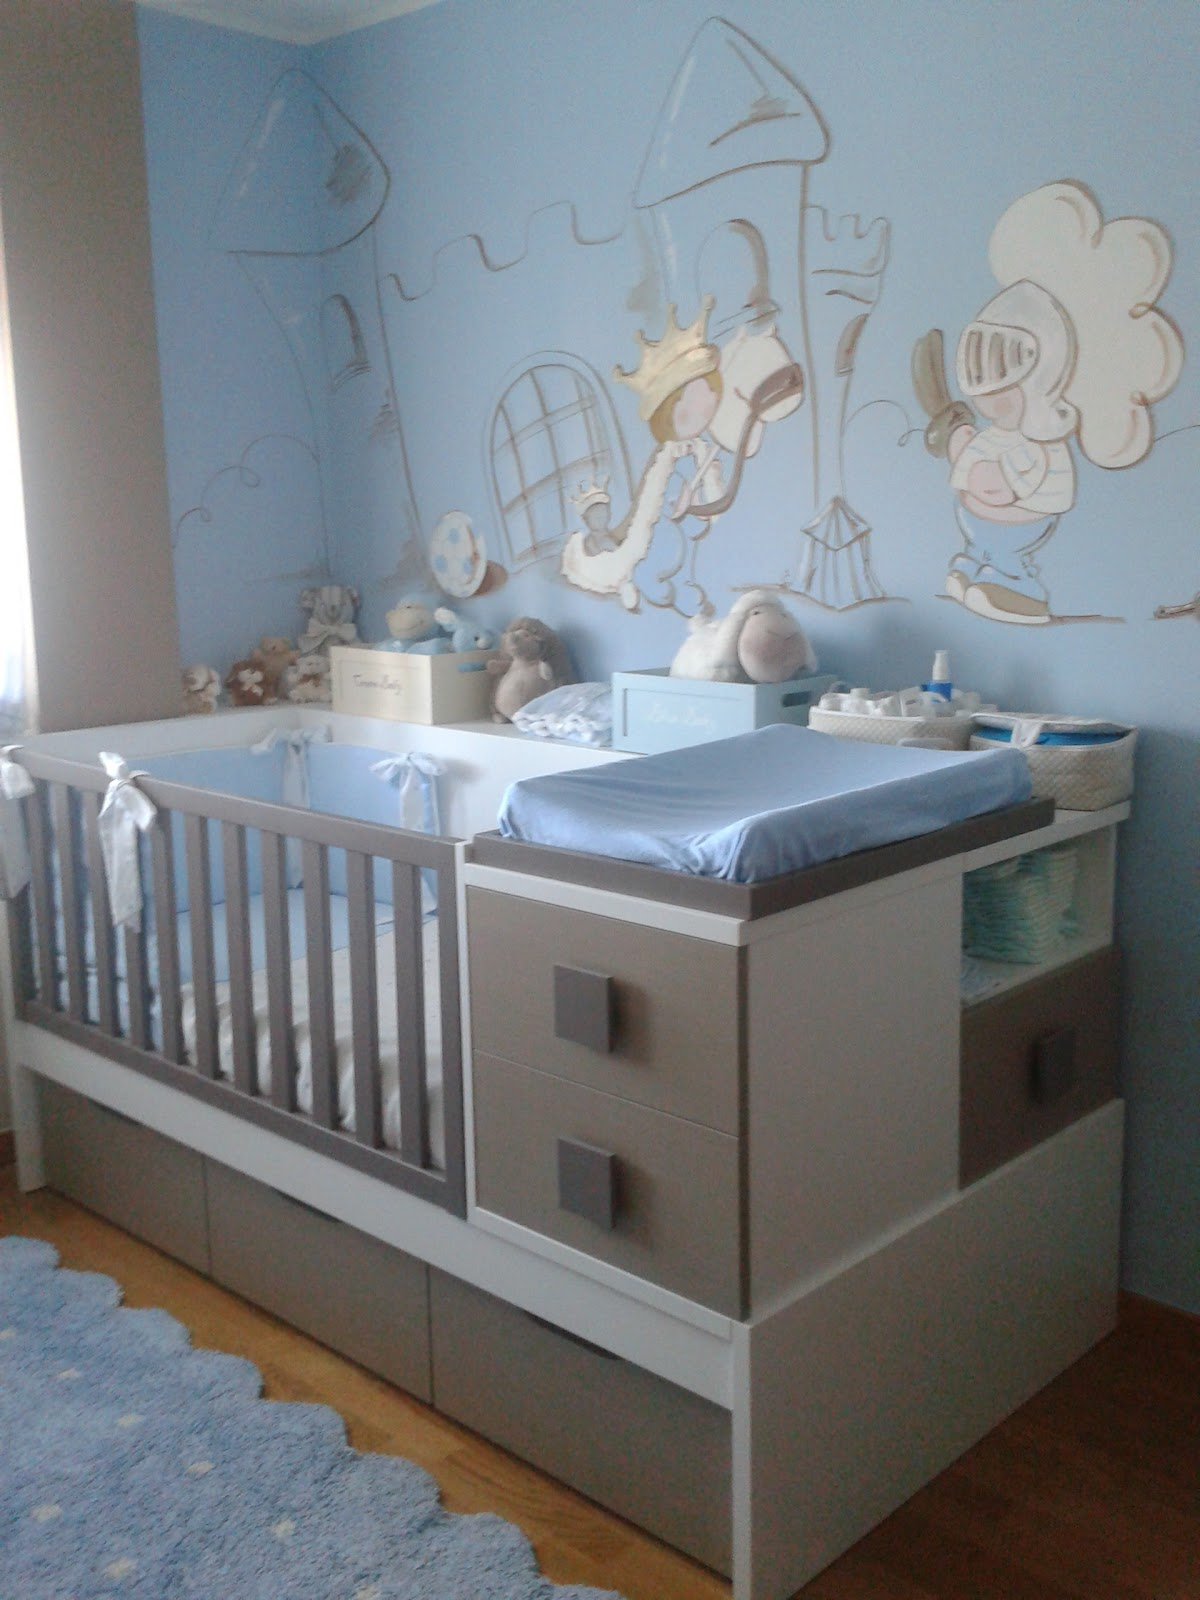 deco chambre b b peinture murale chambre enfant prince. Black Bedroom Furniture Sets. Home Design Ideas